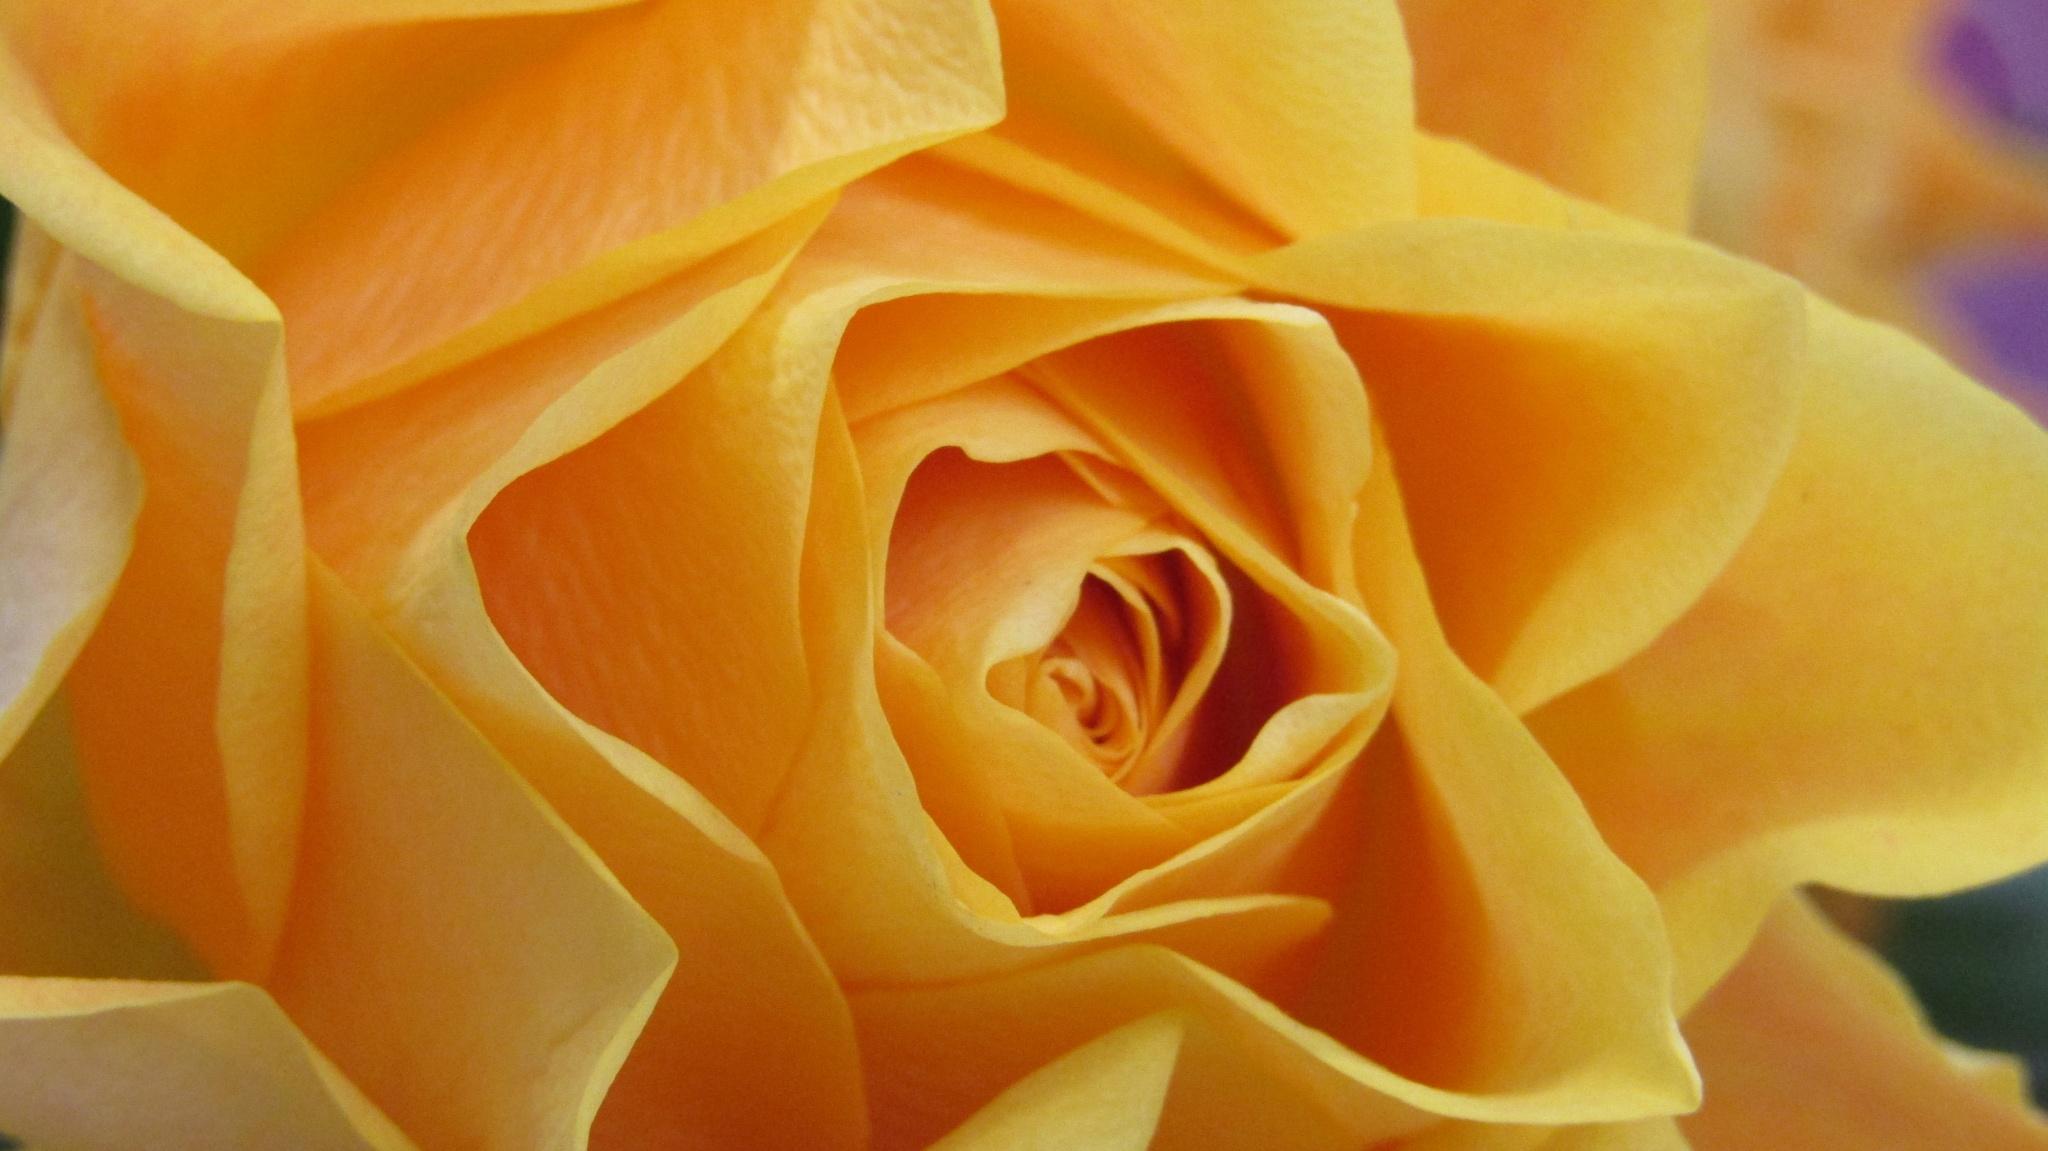 rose by dundacska